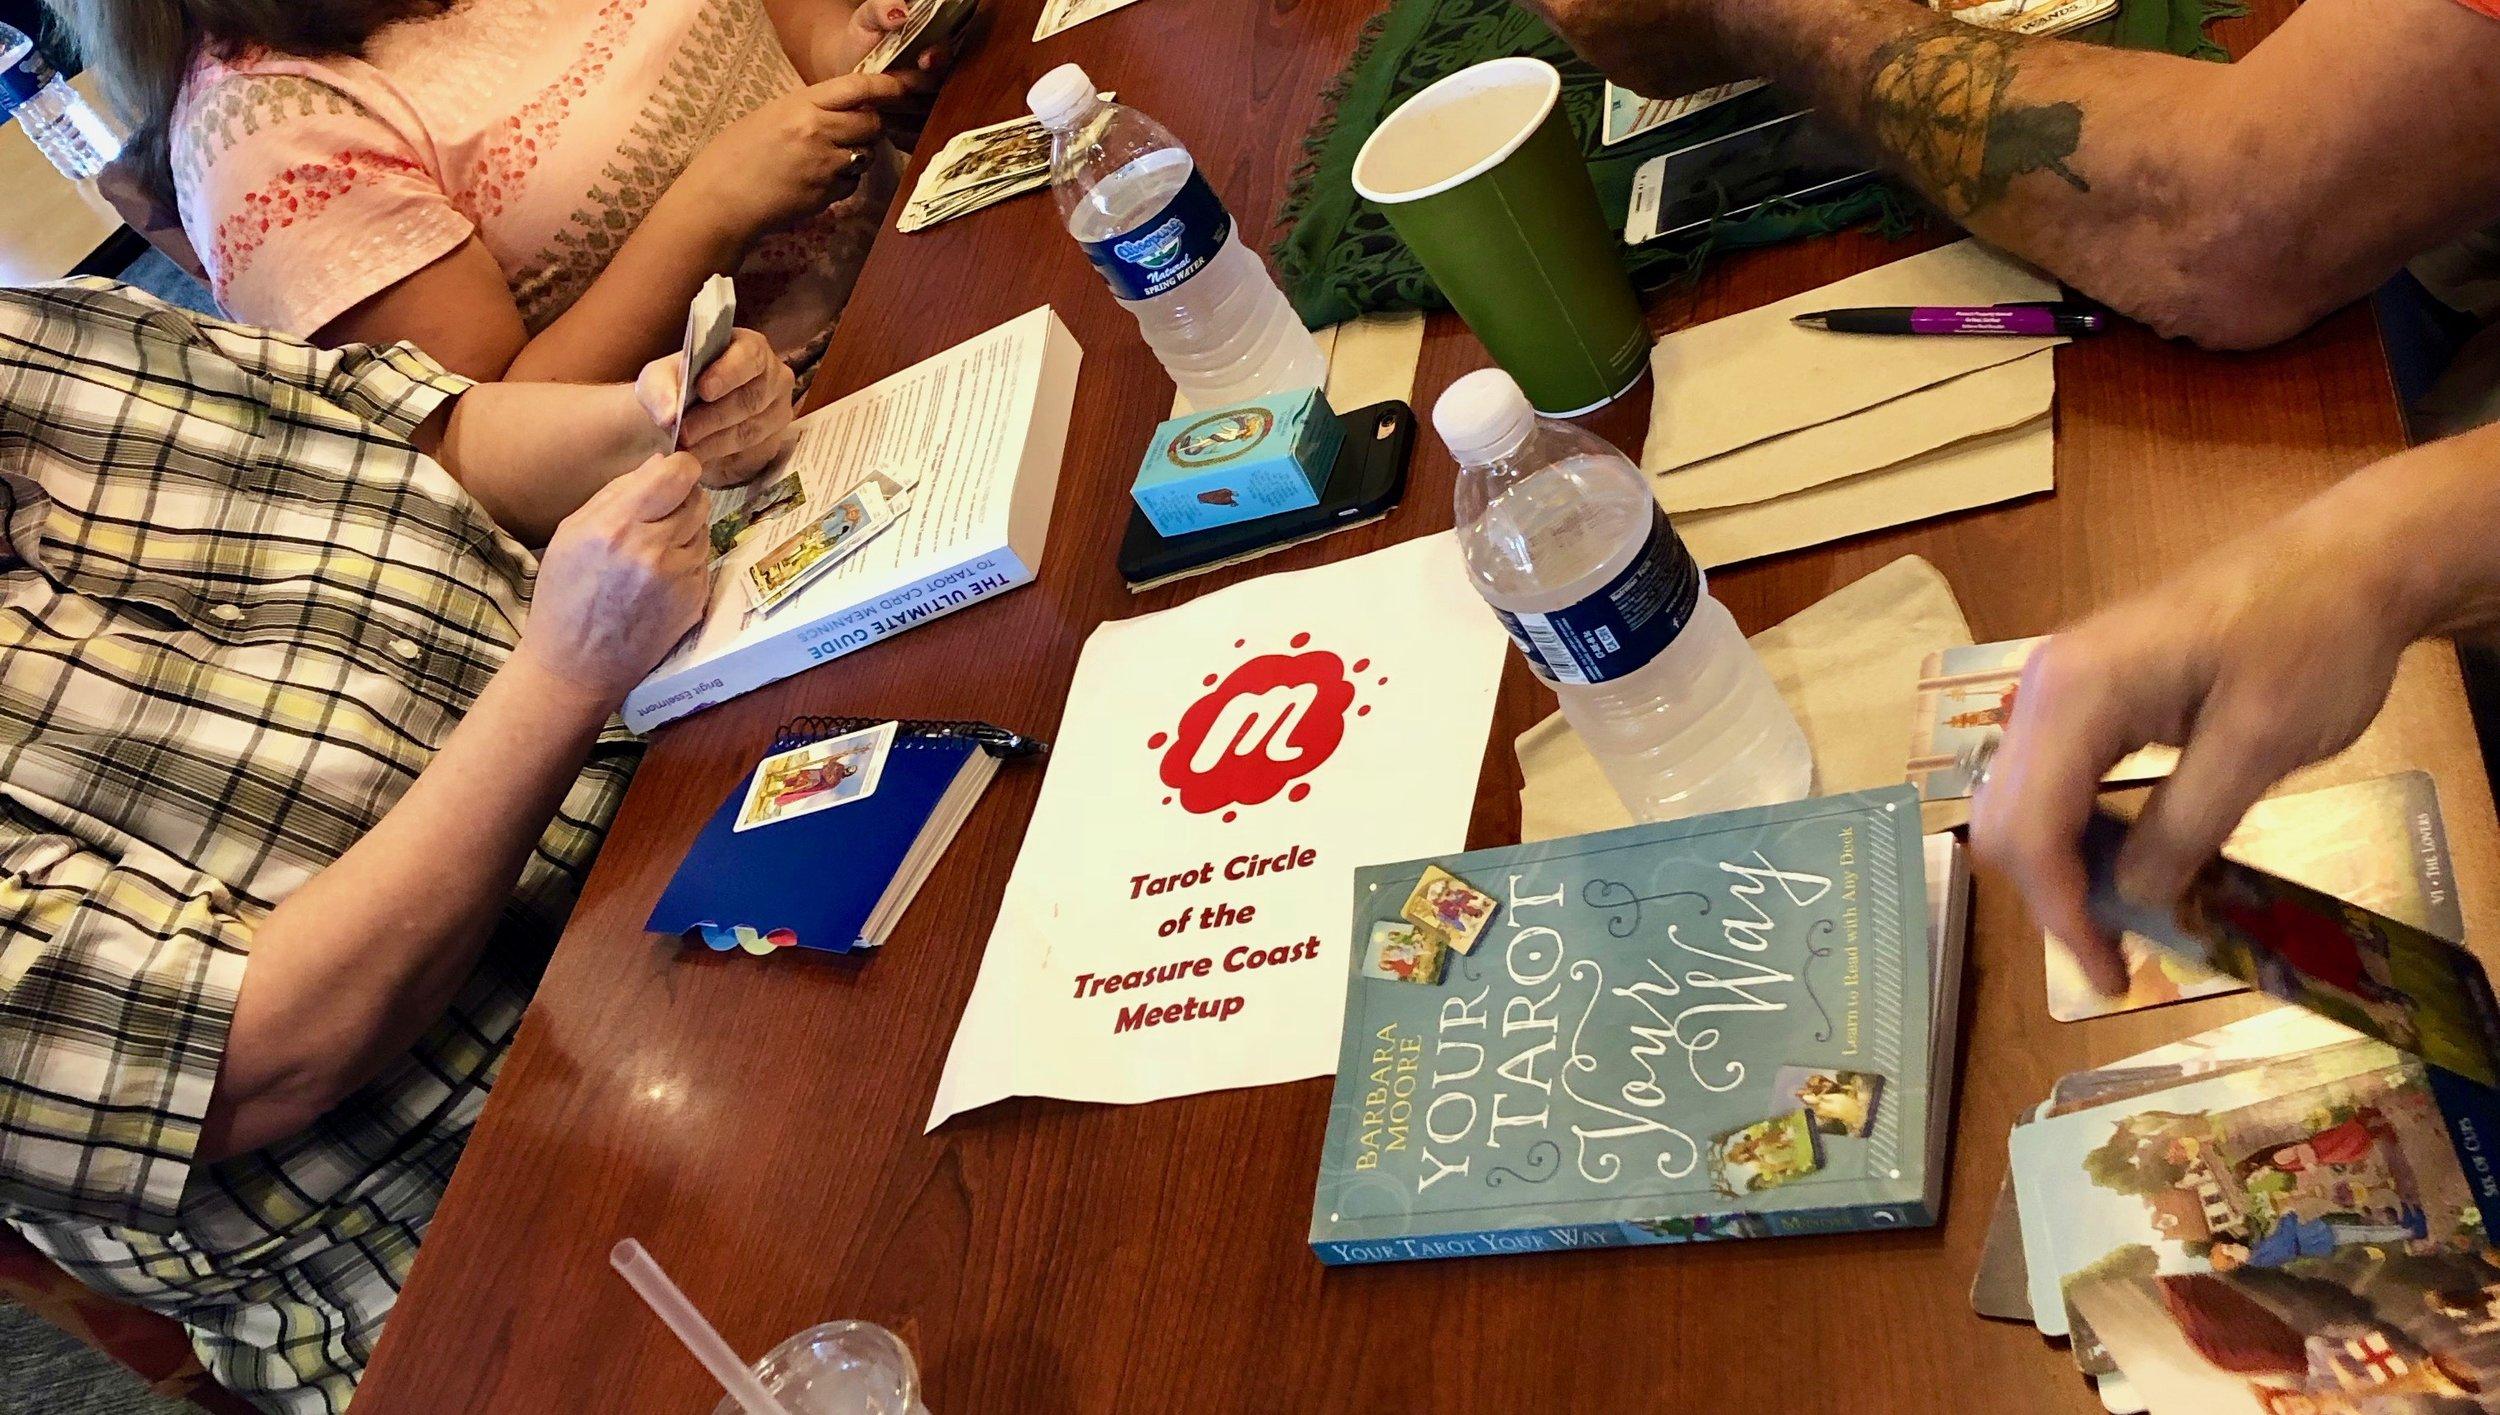 Cards and Conversation Tarot Meetup - at Panera Bread in Palm City, Florida